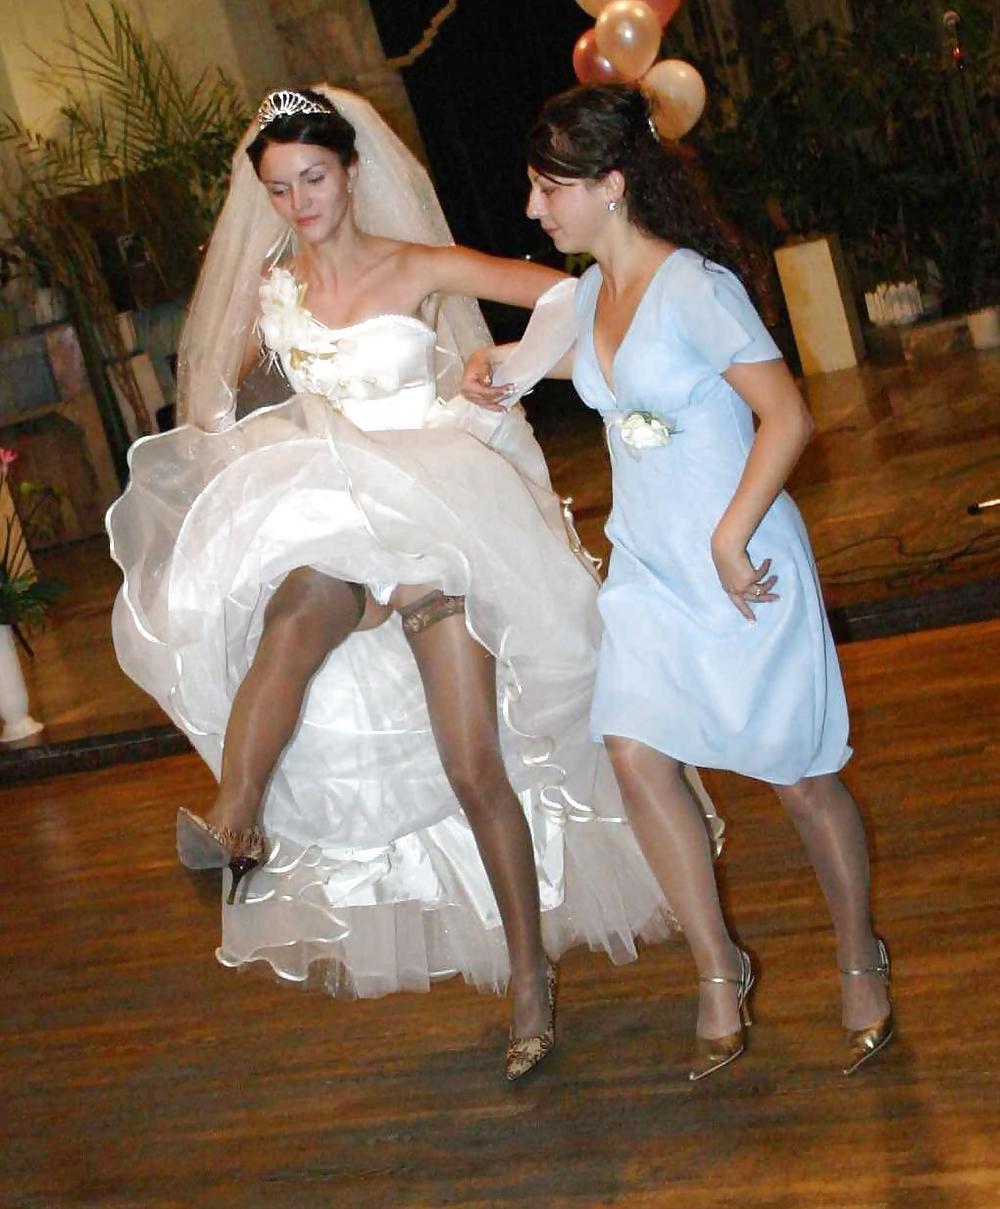 seks-na-svadbe-russkoy